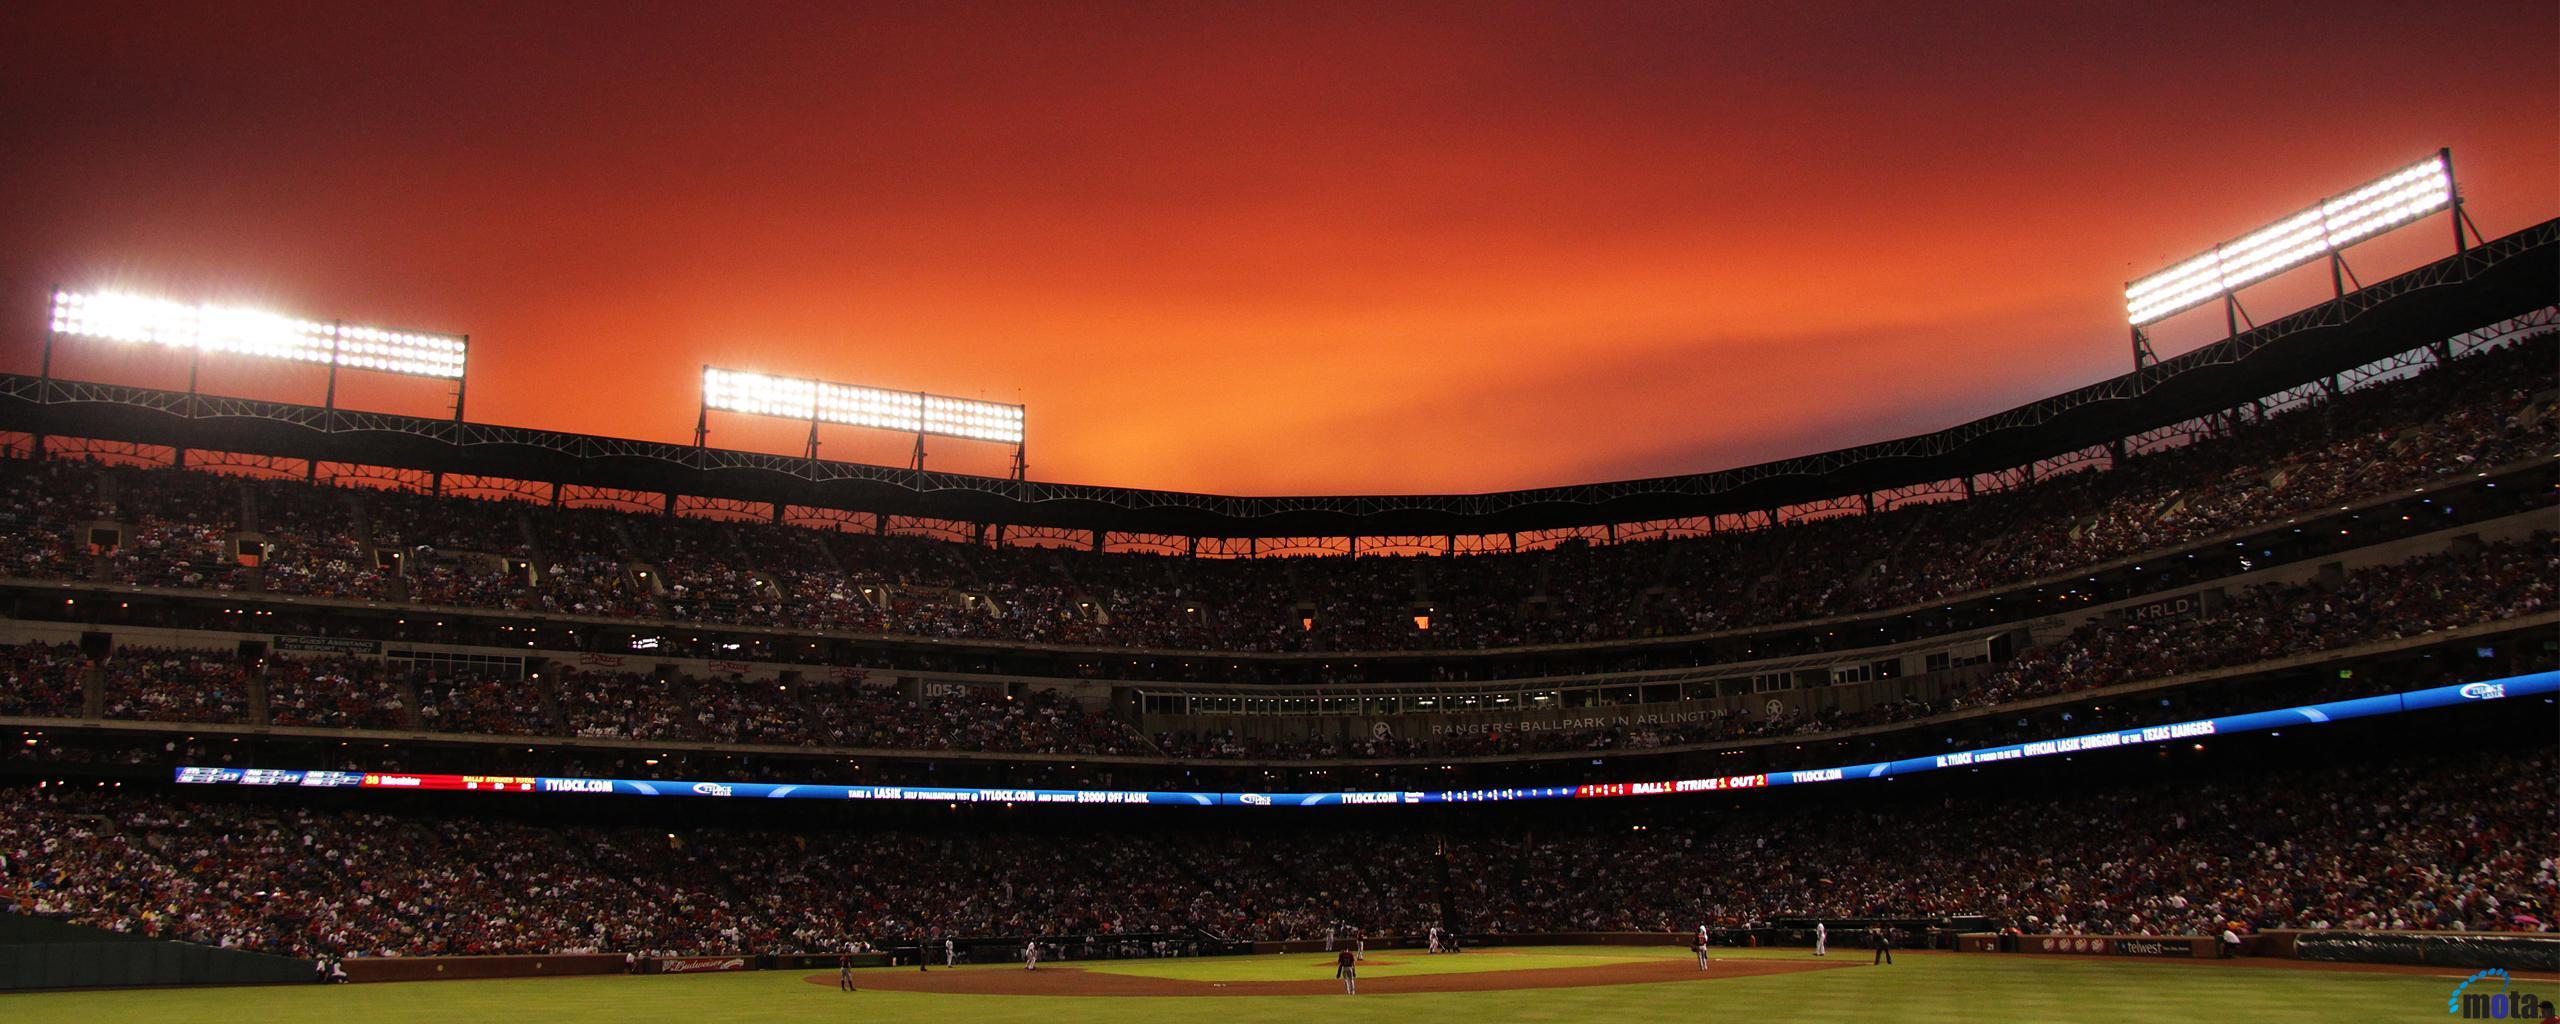 93 Wallpaper Arlington Tx Texas Rangers Baseball Arlington